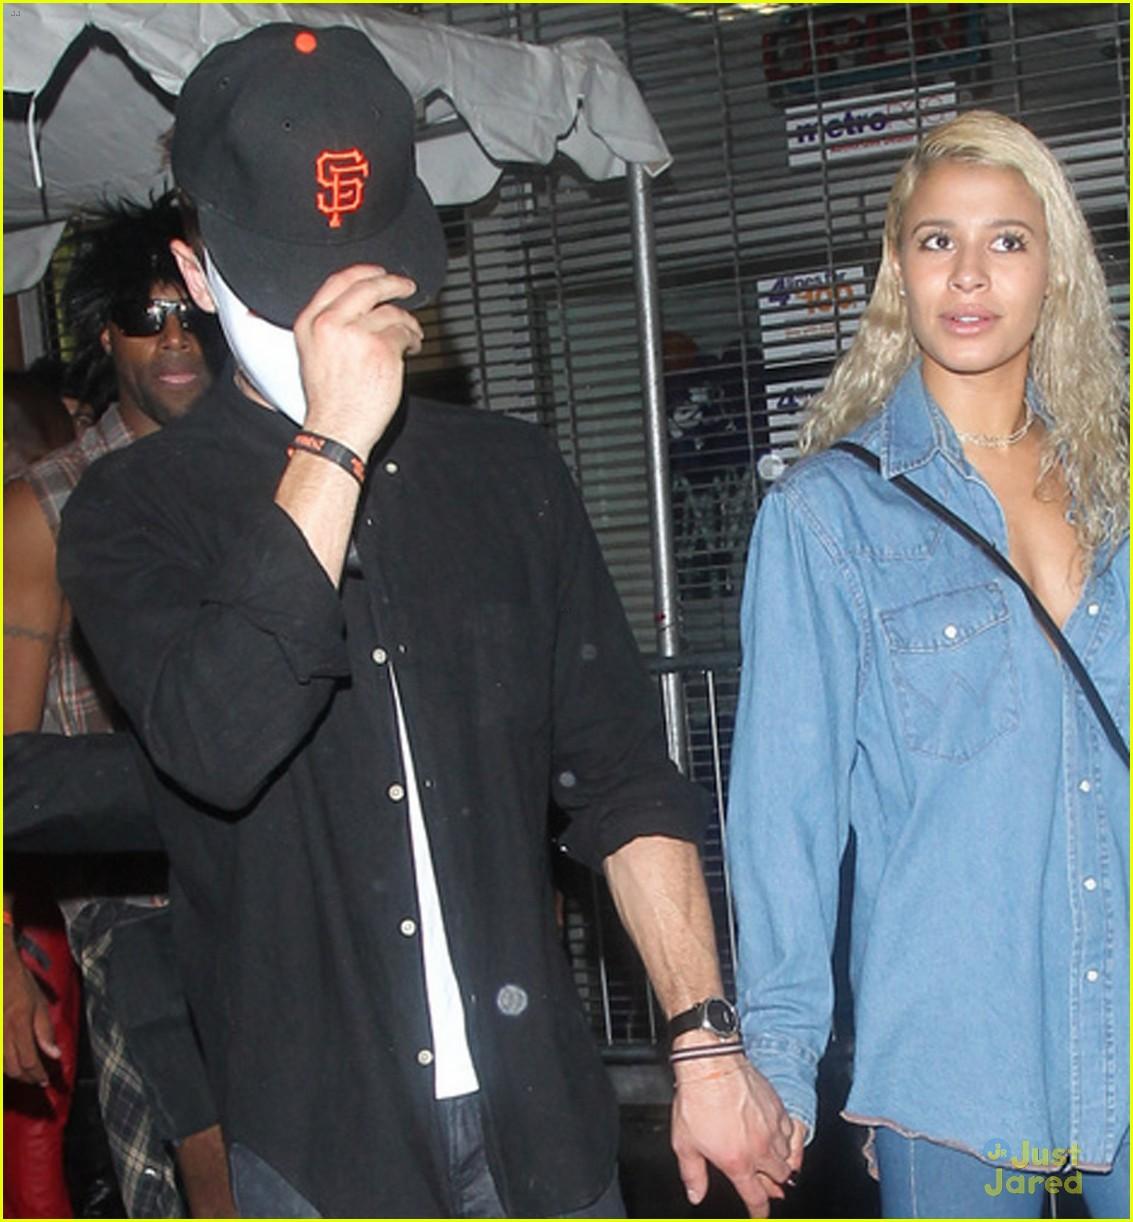 Zac Efron & Sami Miro Hold Hands on Halloween | Photo 737060 ...